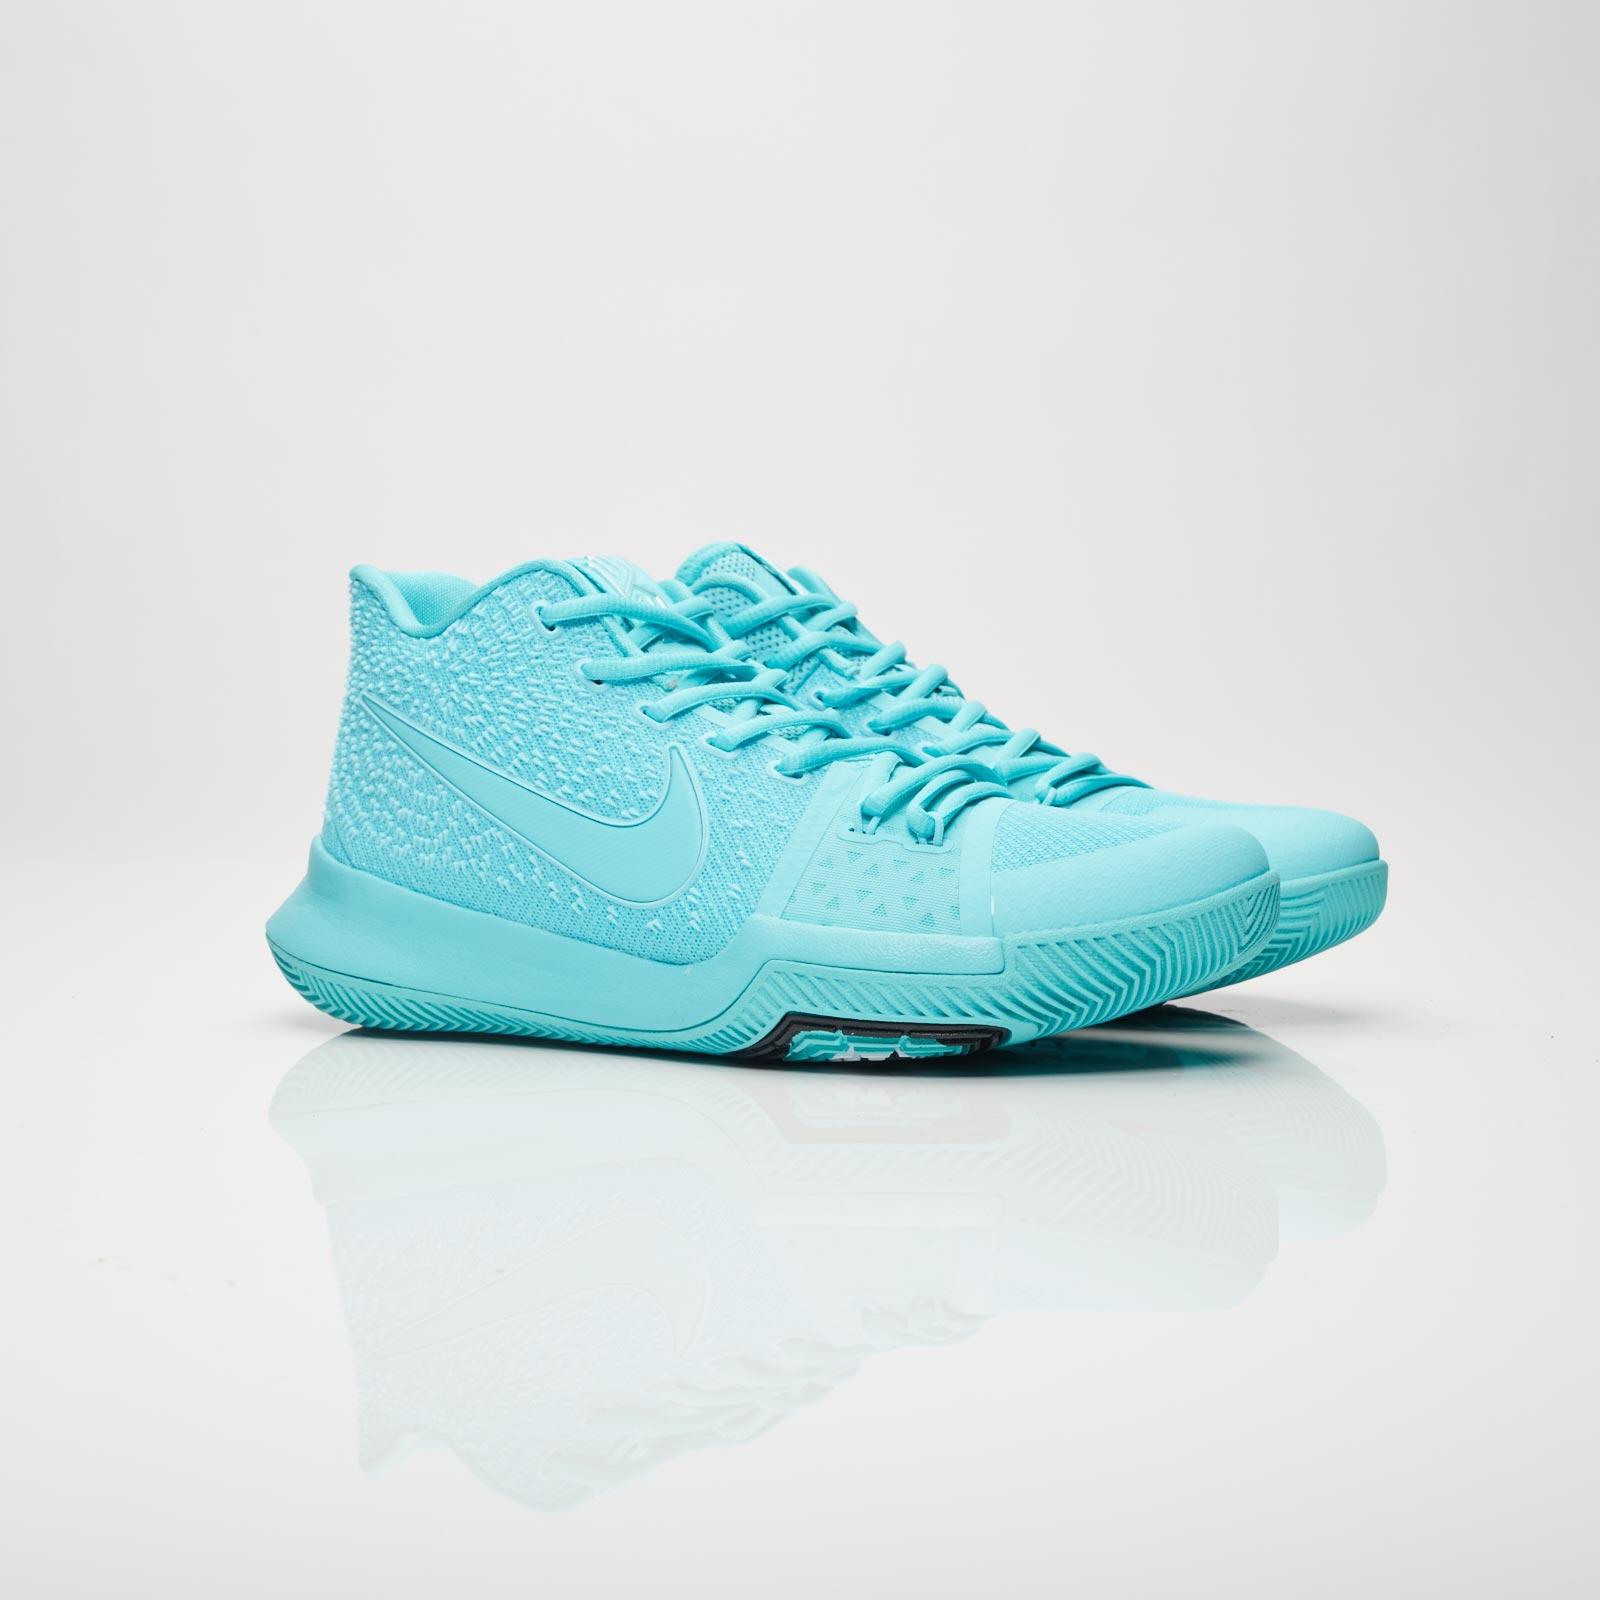 bc223995b52f Nike Kyrie 3 - 852395-401 - Sneakersnstuff